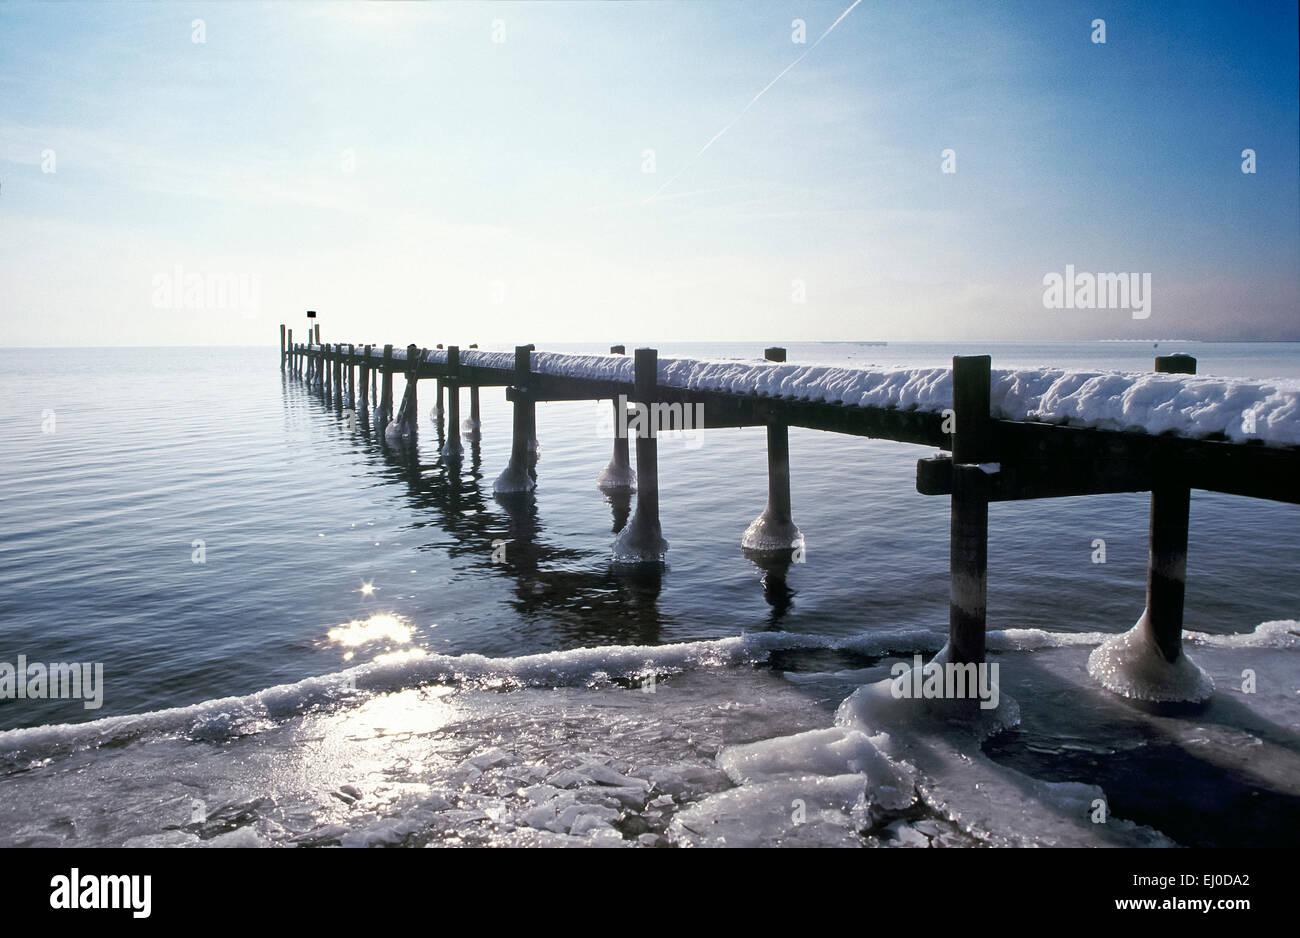 Bavaria, Europe, Germany, Upper Bavaria, Chiemsee, Herreninsel, Herrenwörth, Chiemgau, sky, lake, water, footbridge, - Stock Image